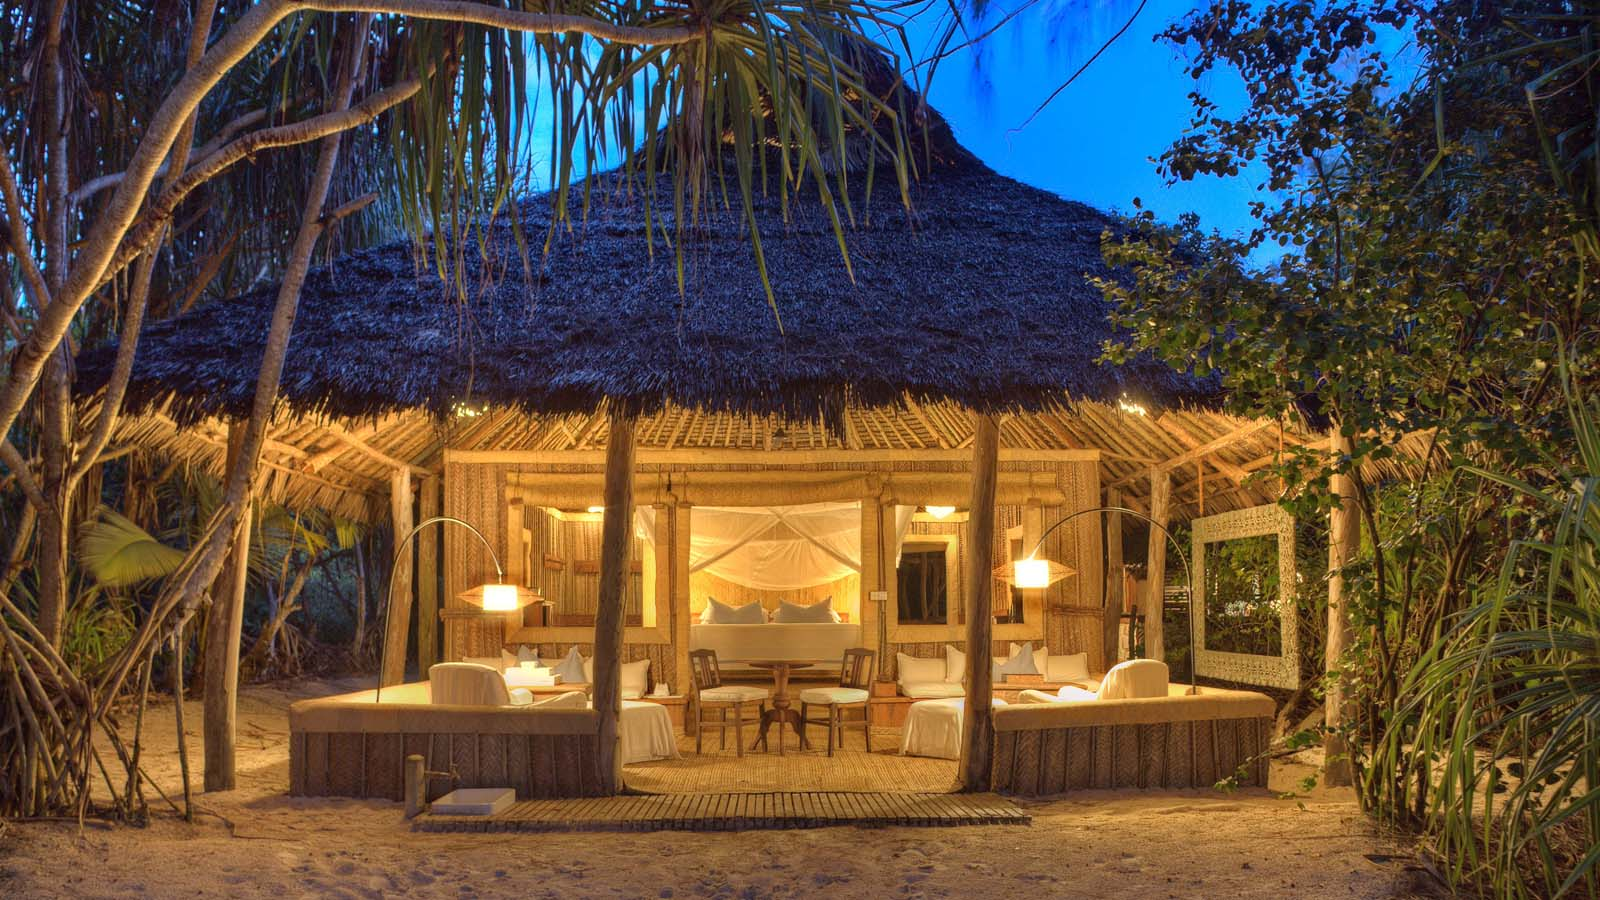 The private and luxurious accomodations at Mnemba Island Lodge, a private island in Zanzibar, Tanzania